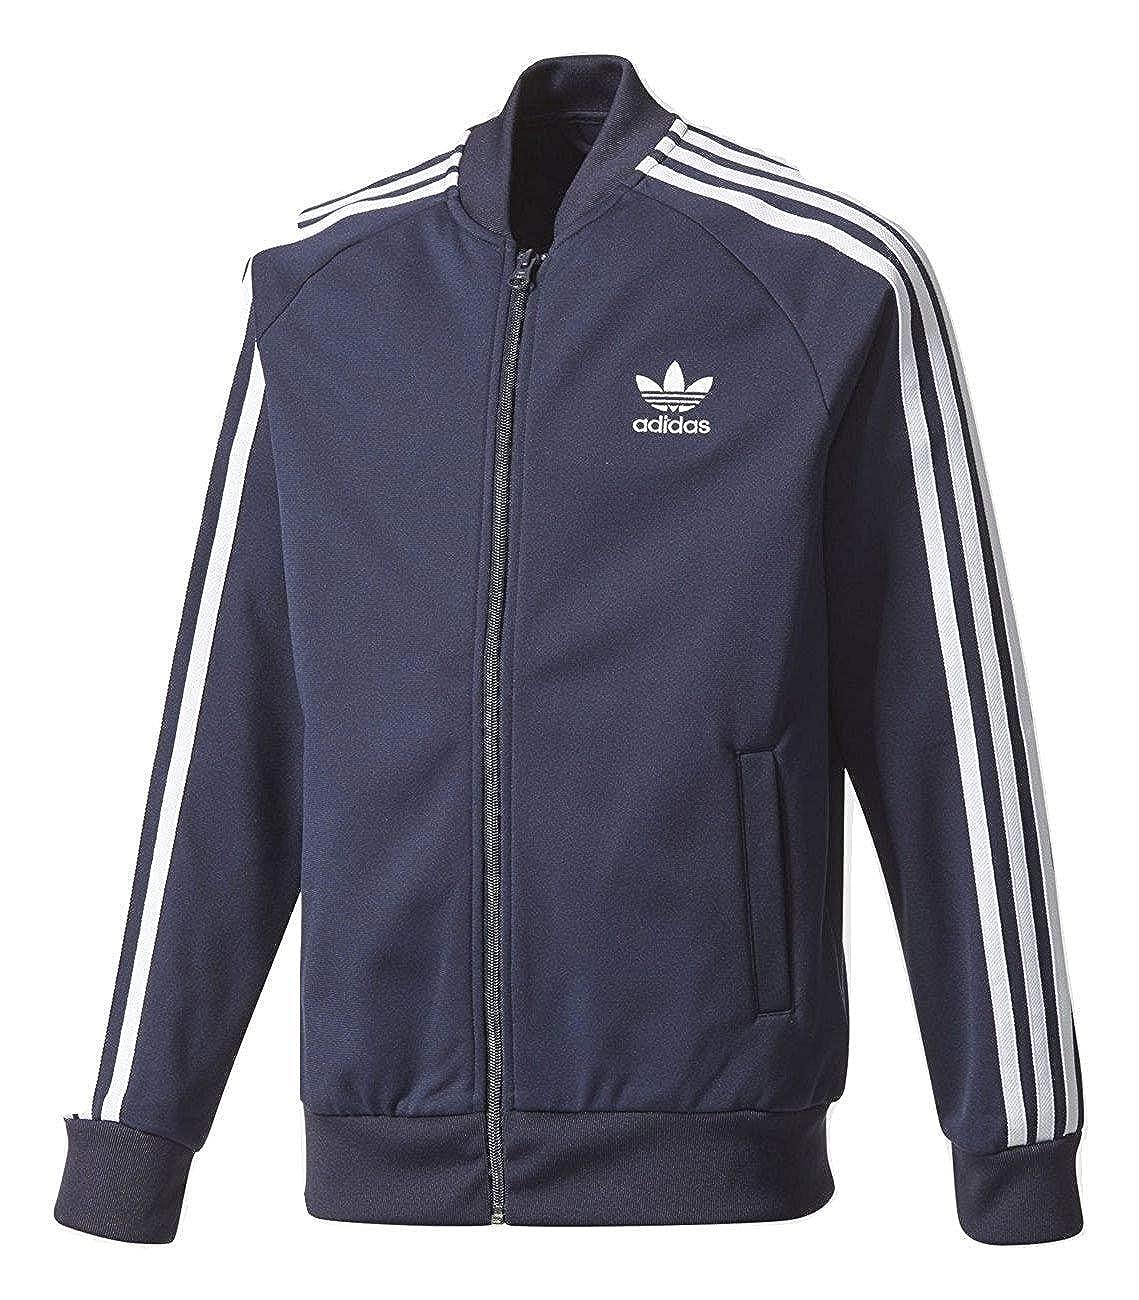 new arrival 10a87 11a8d Amazon.com  adidas Boys SST Track Jacket  Clothing